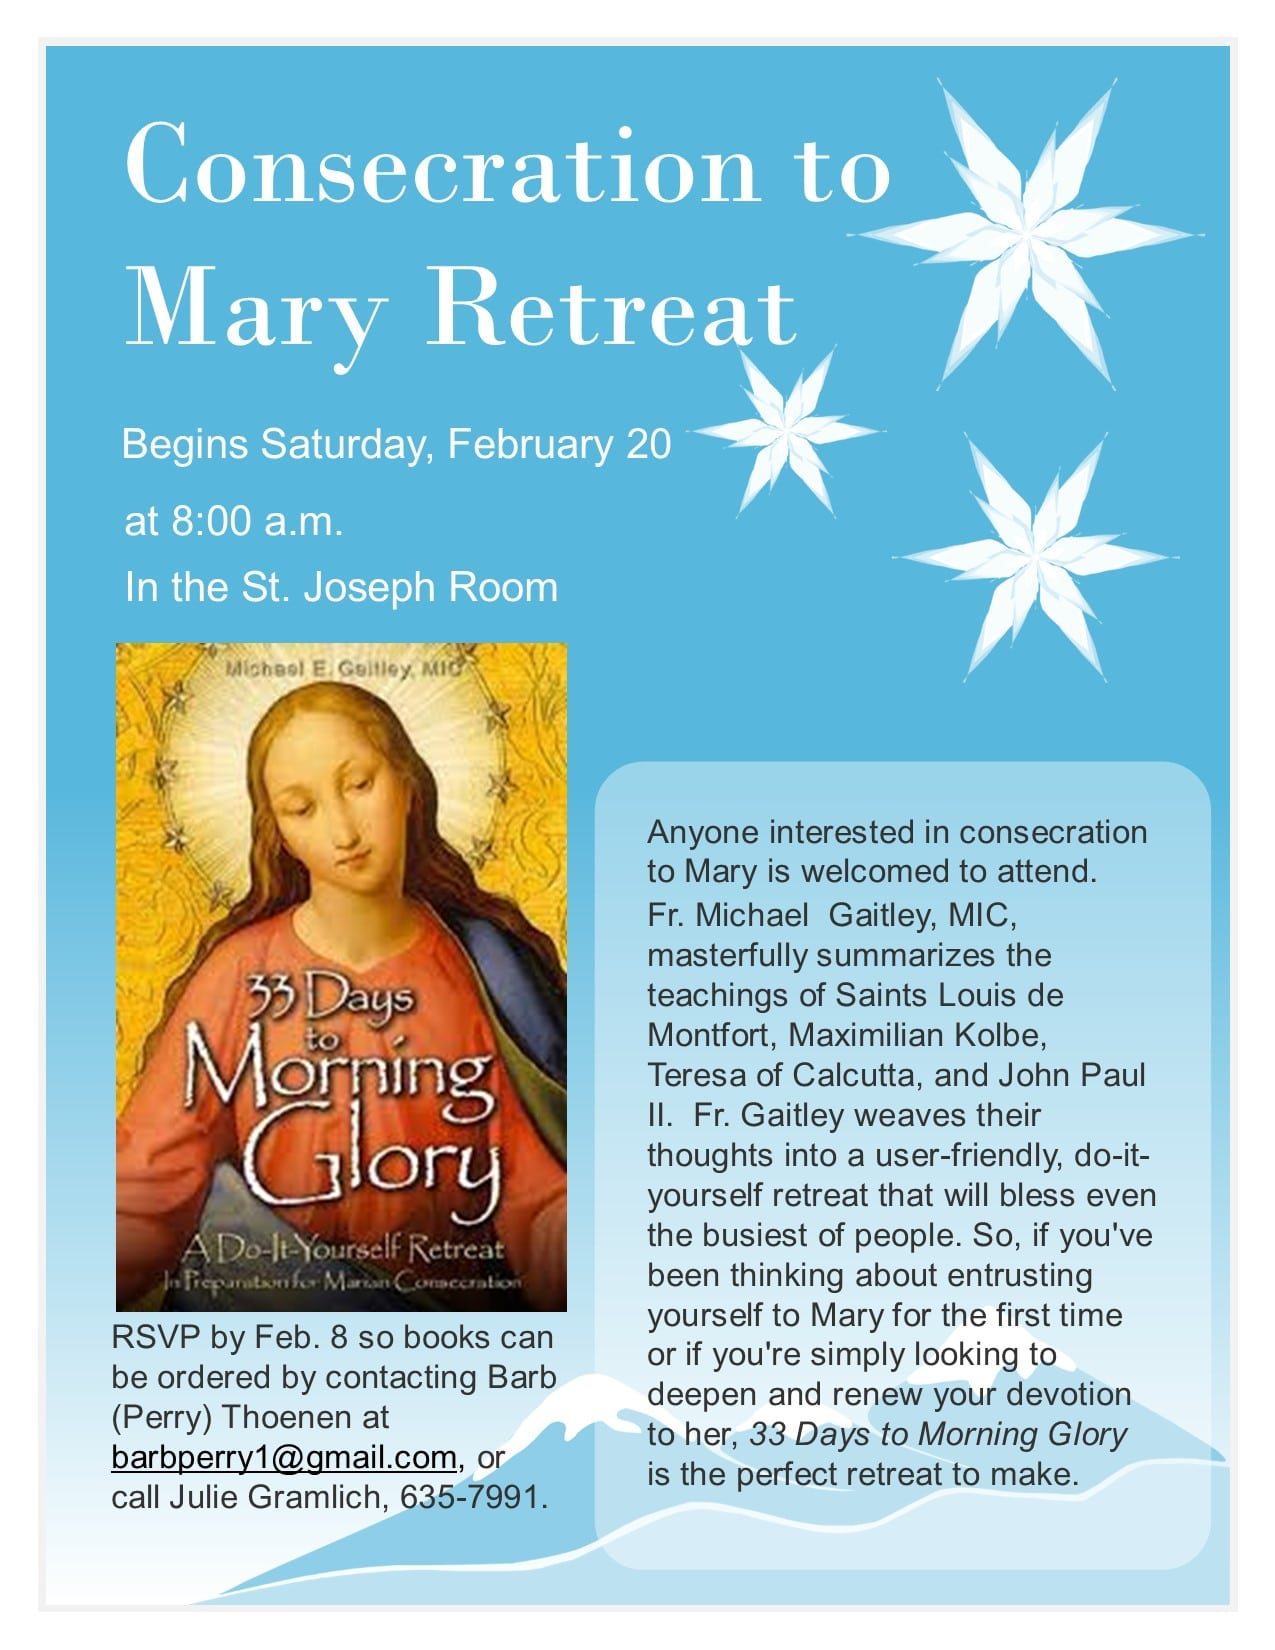 33 Days To Morning Glory Retreat